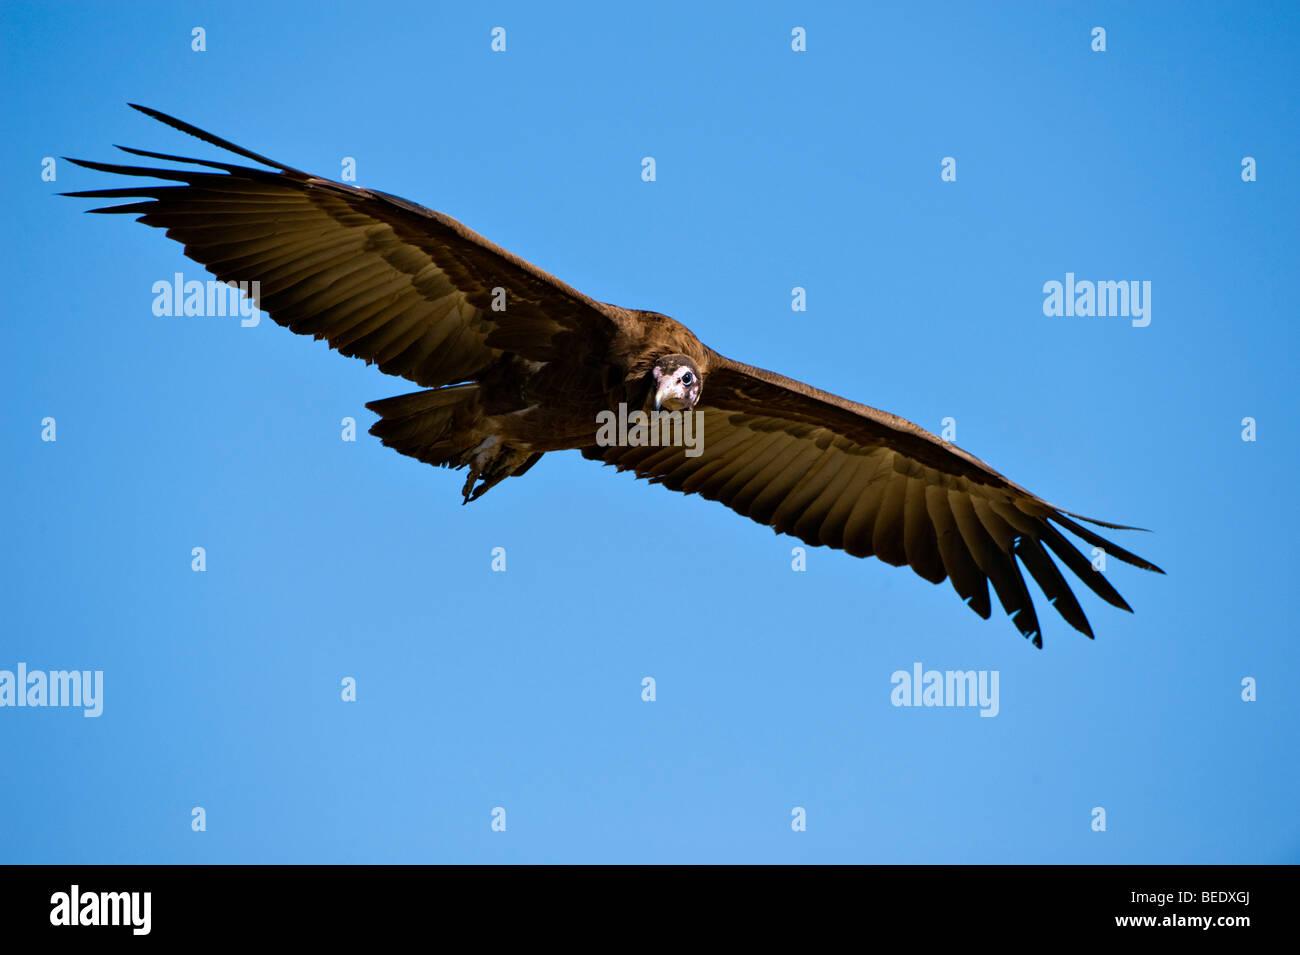 Hooded Vulture (Necrosyrtes monachus) in flight, Masai Mara Nature Reserve, Kenya, East Africa Stock Photo